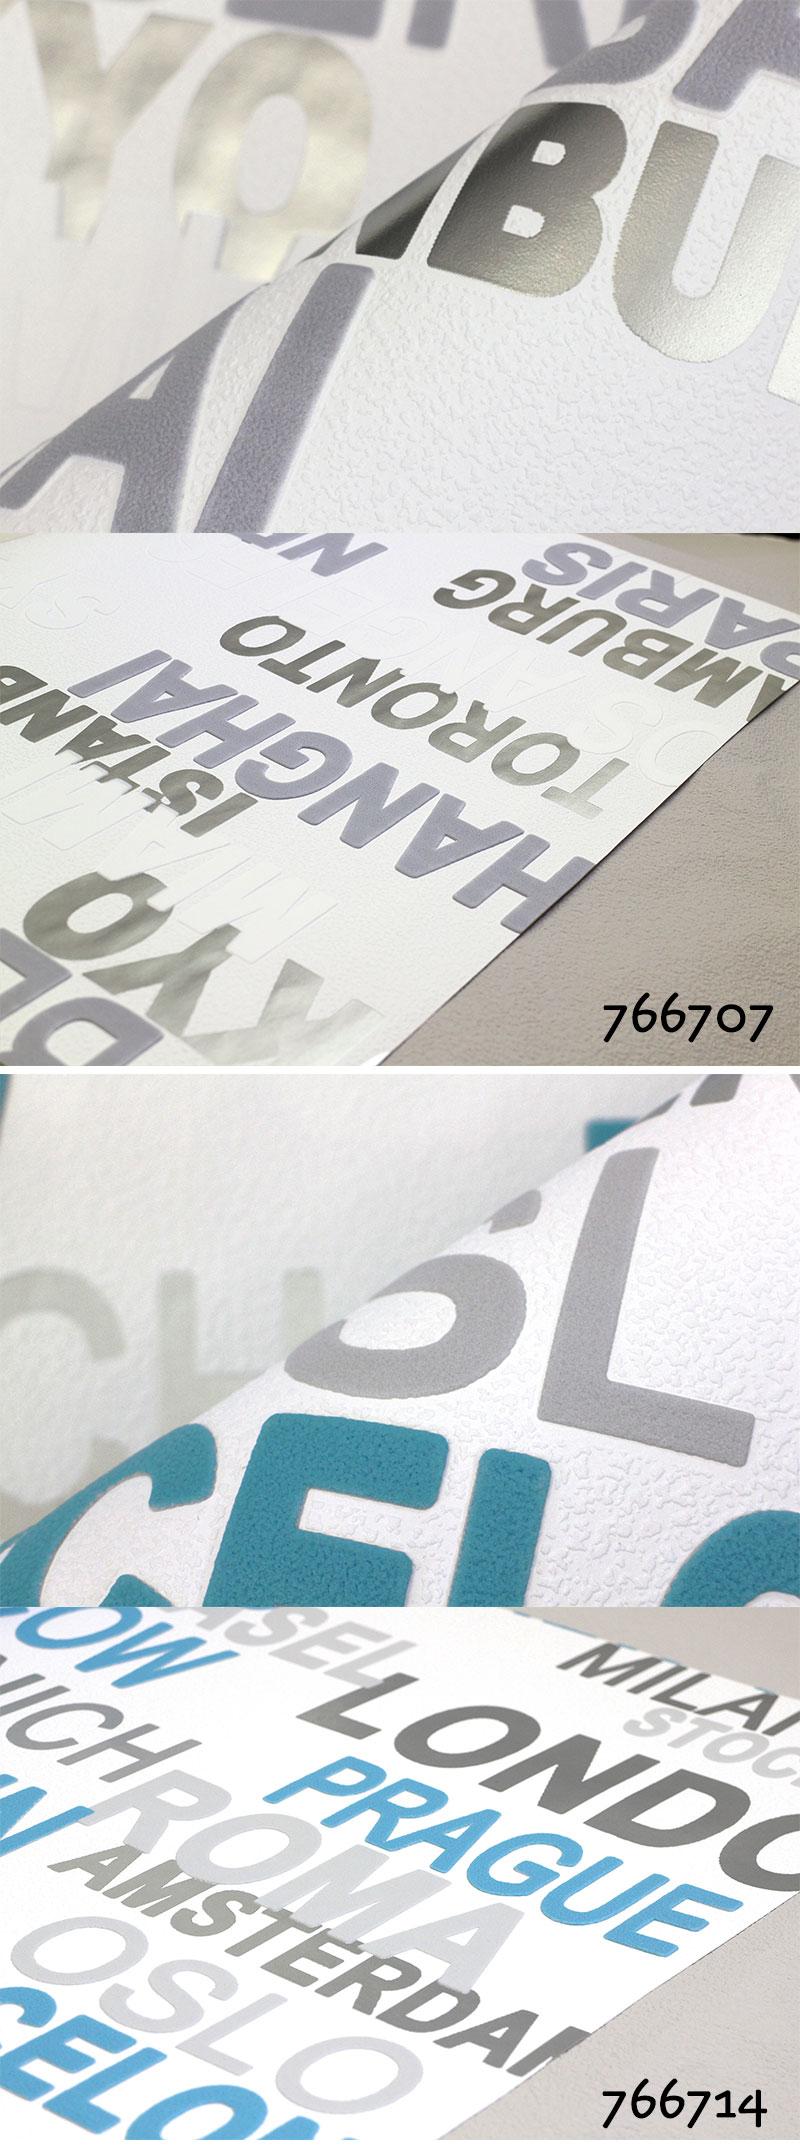 Peeloff Peel Off Peel Off Imported Wallpaper Wallpaper Rasch (rush)  Wallpaper F